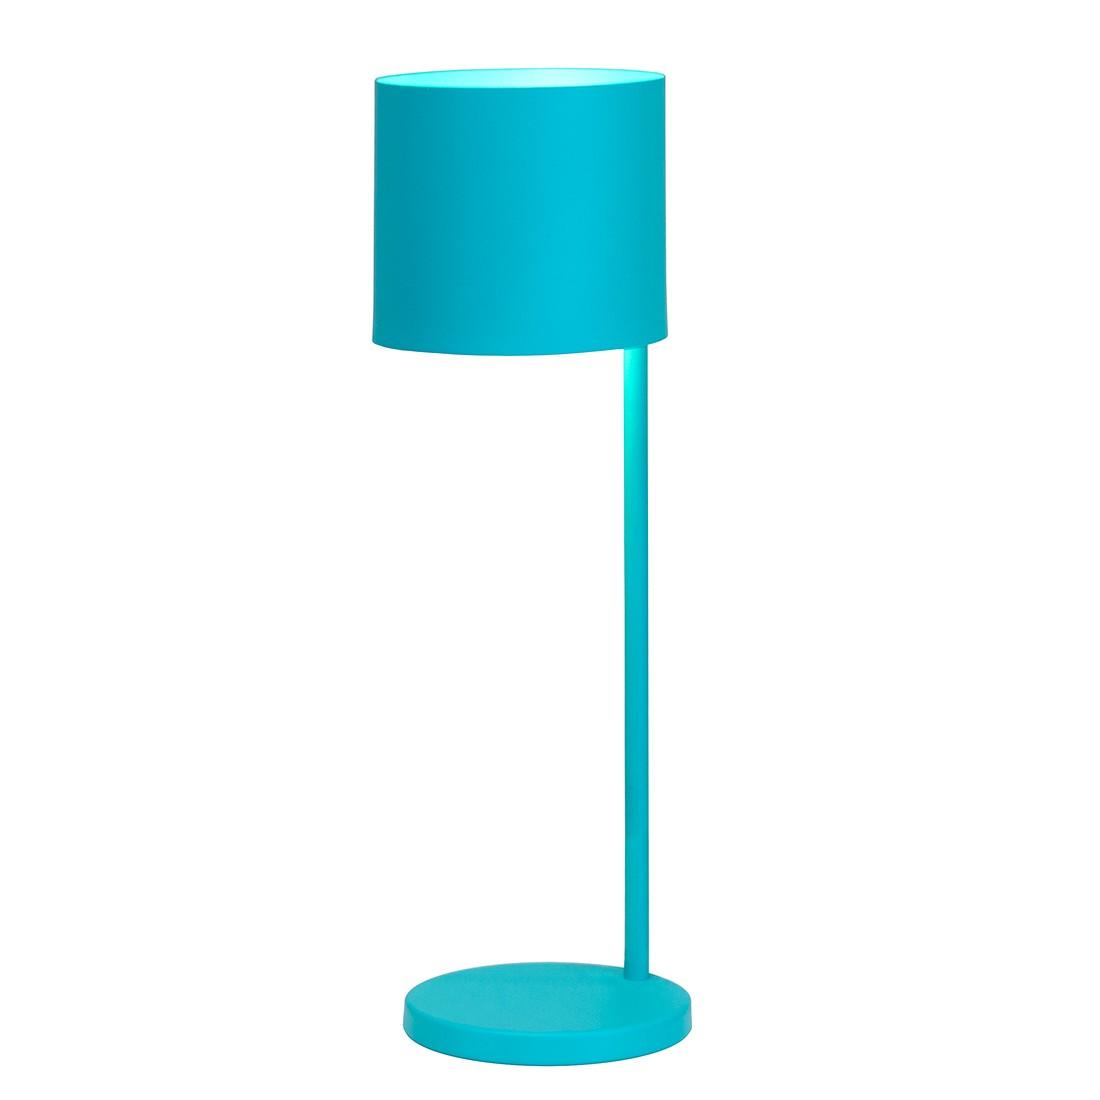 Tischleuchte Selene ● Metall ● Blau ● 1-flammig- Brilliant A++